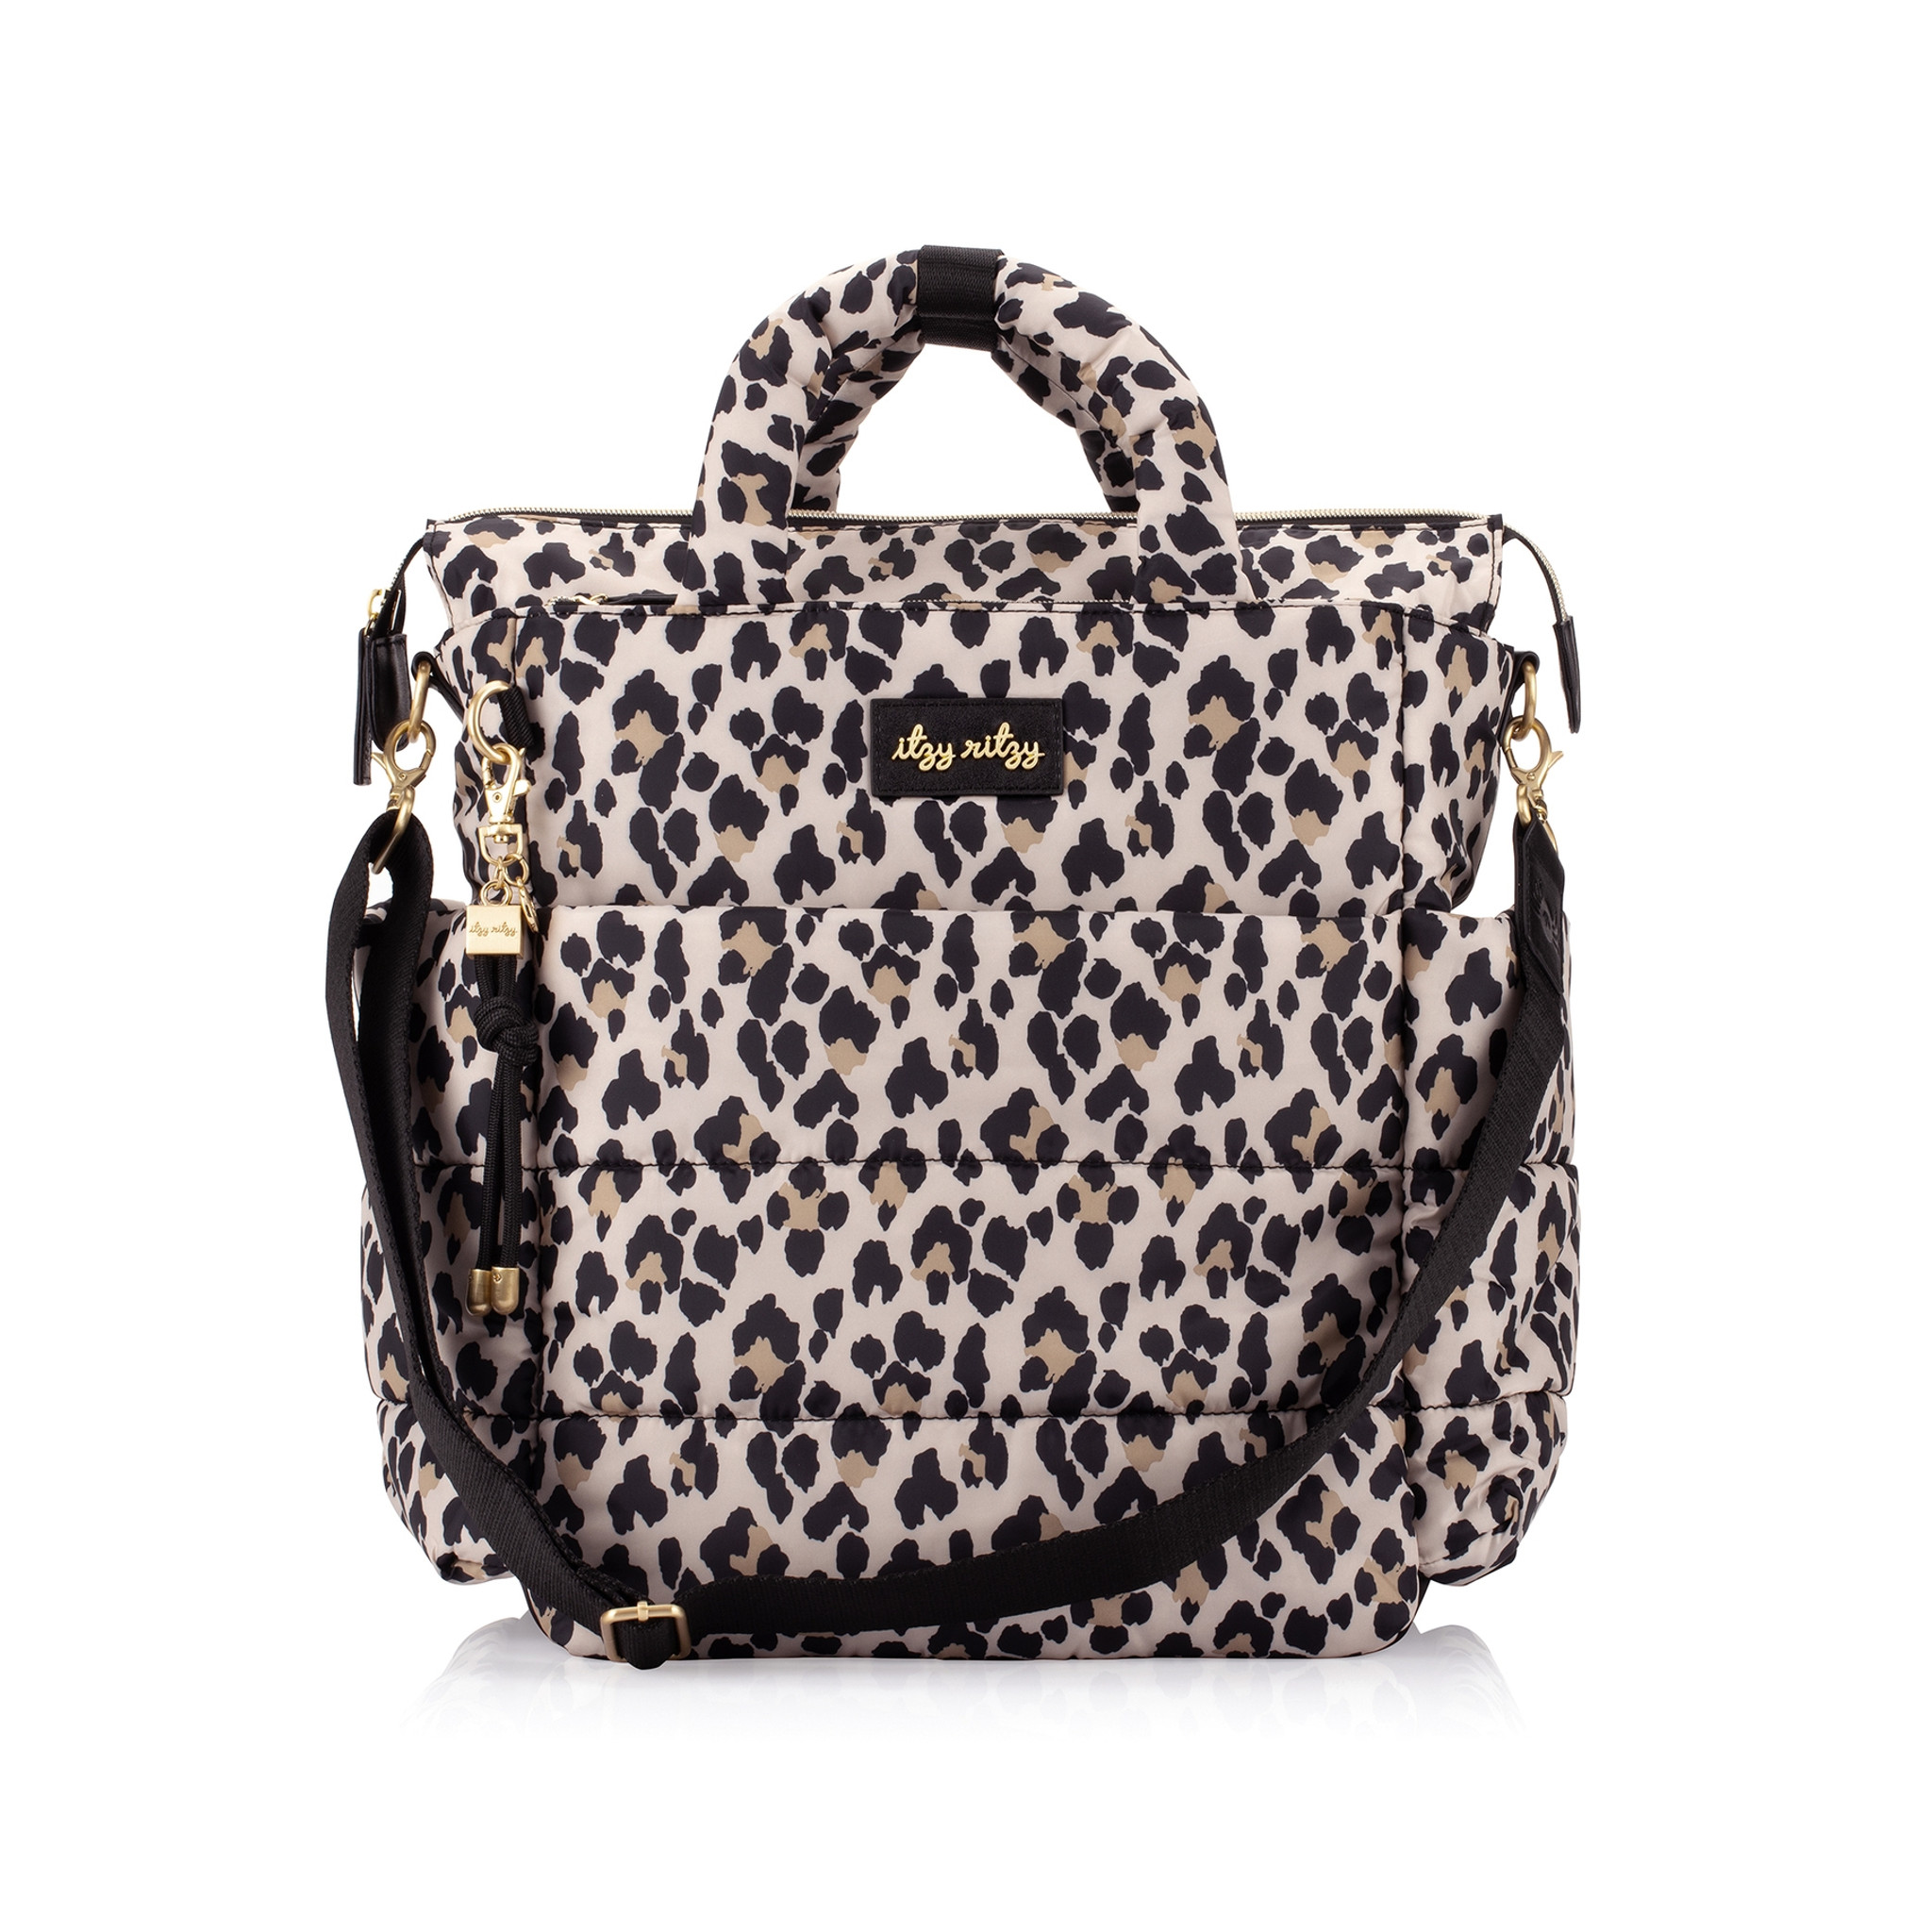 Dream Convertible Backpack Diaper Bag - Leopard